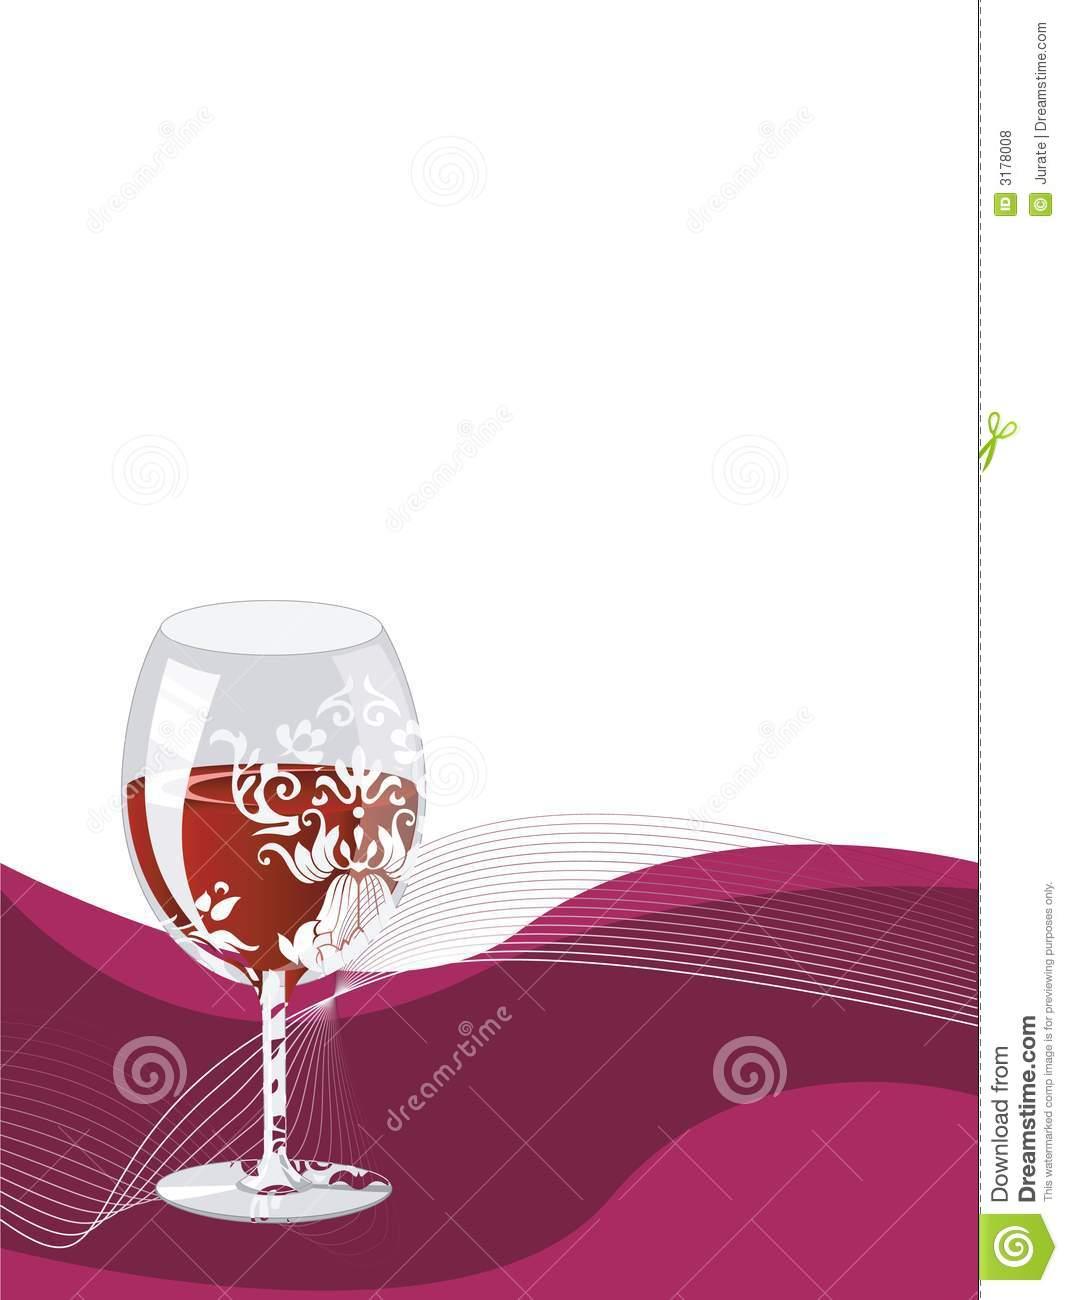 Wine tasting party invitation wording stopboris Gallery